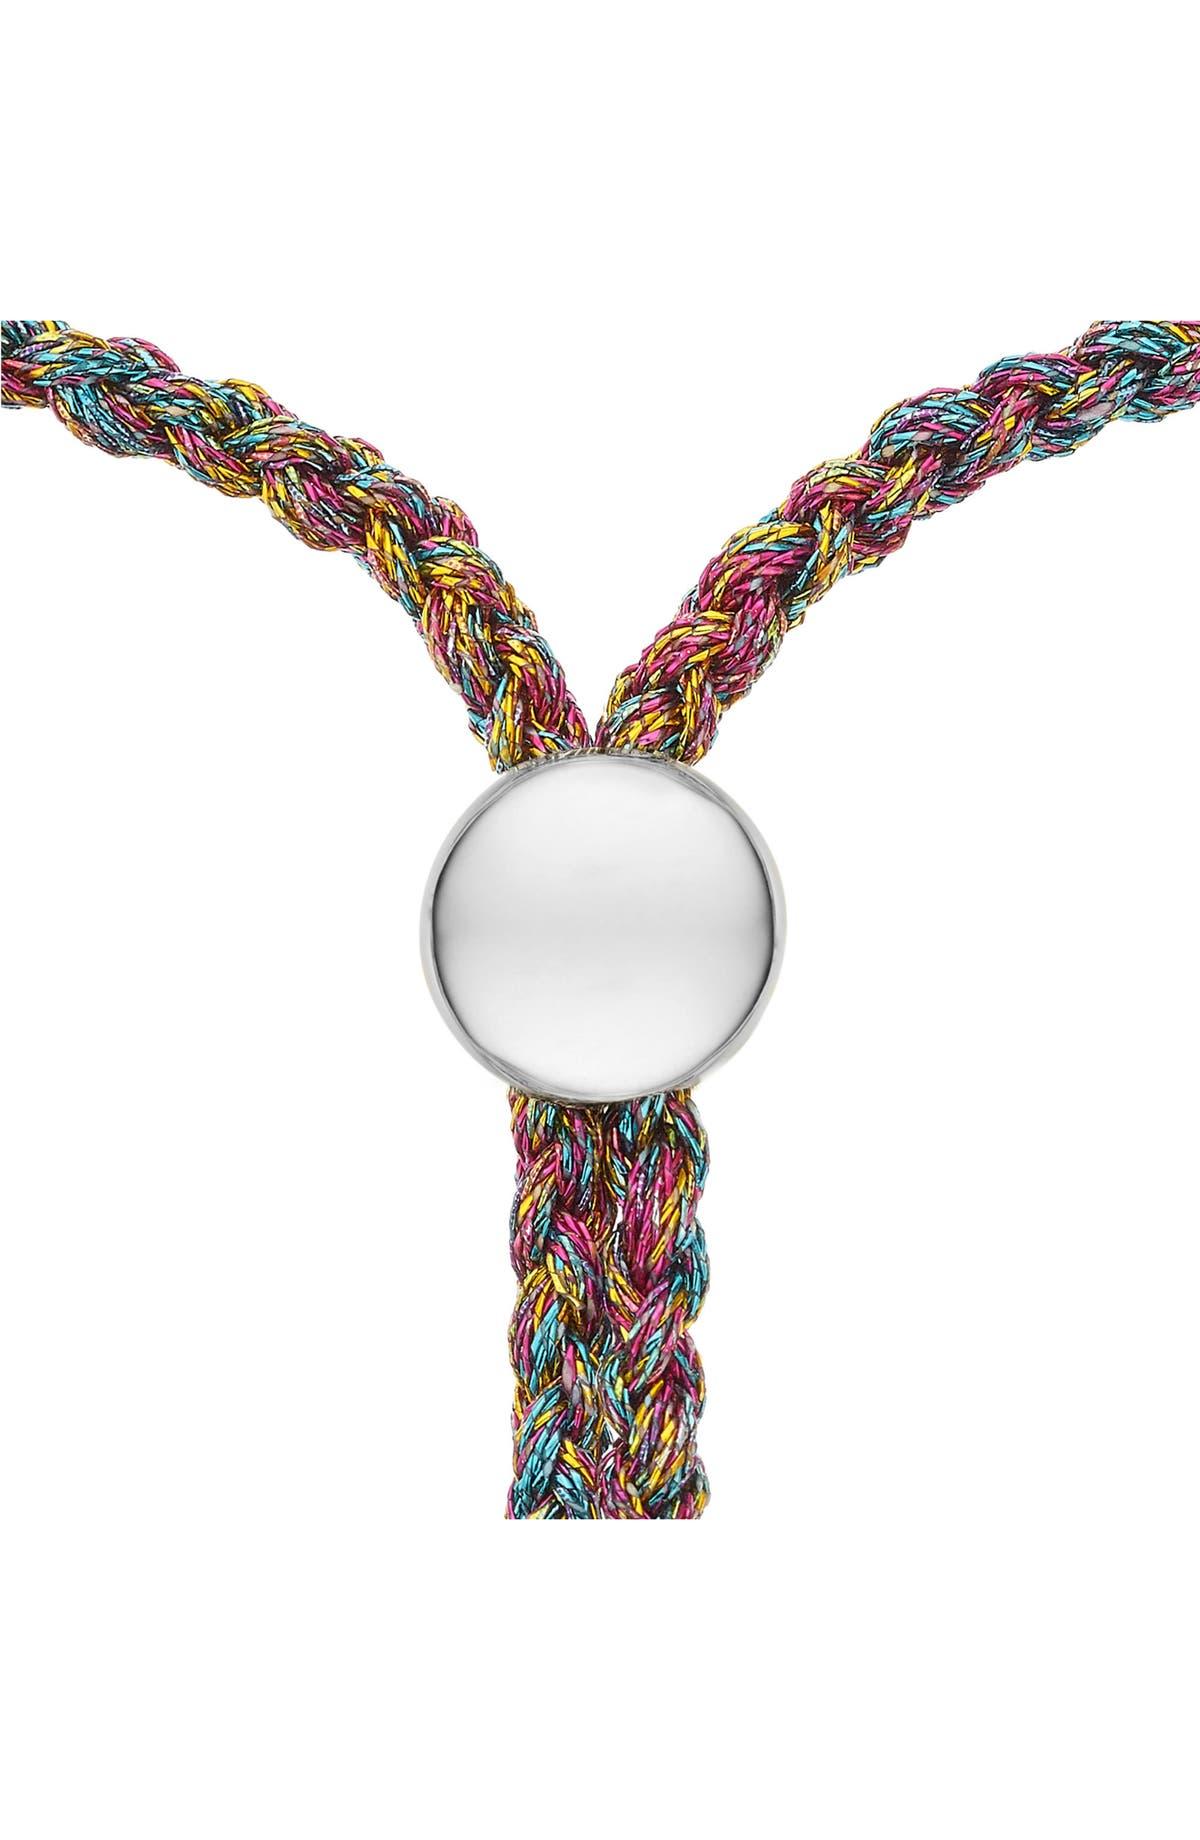 31518599349f6 Monica Vinader Engravable Petite Fiji Friendship Bracelet   Nordstrom